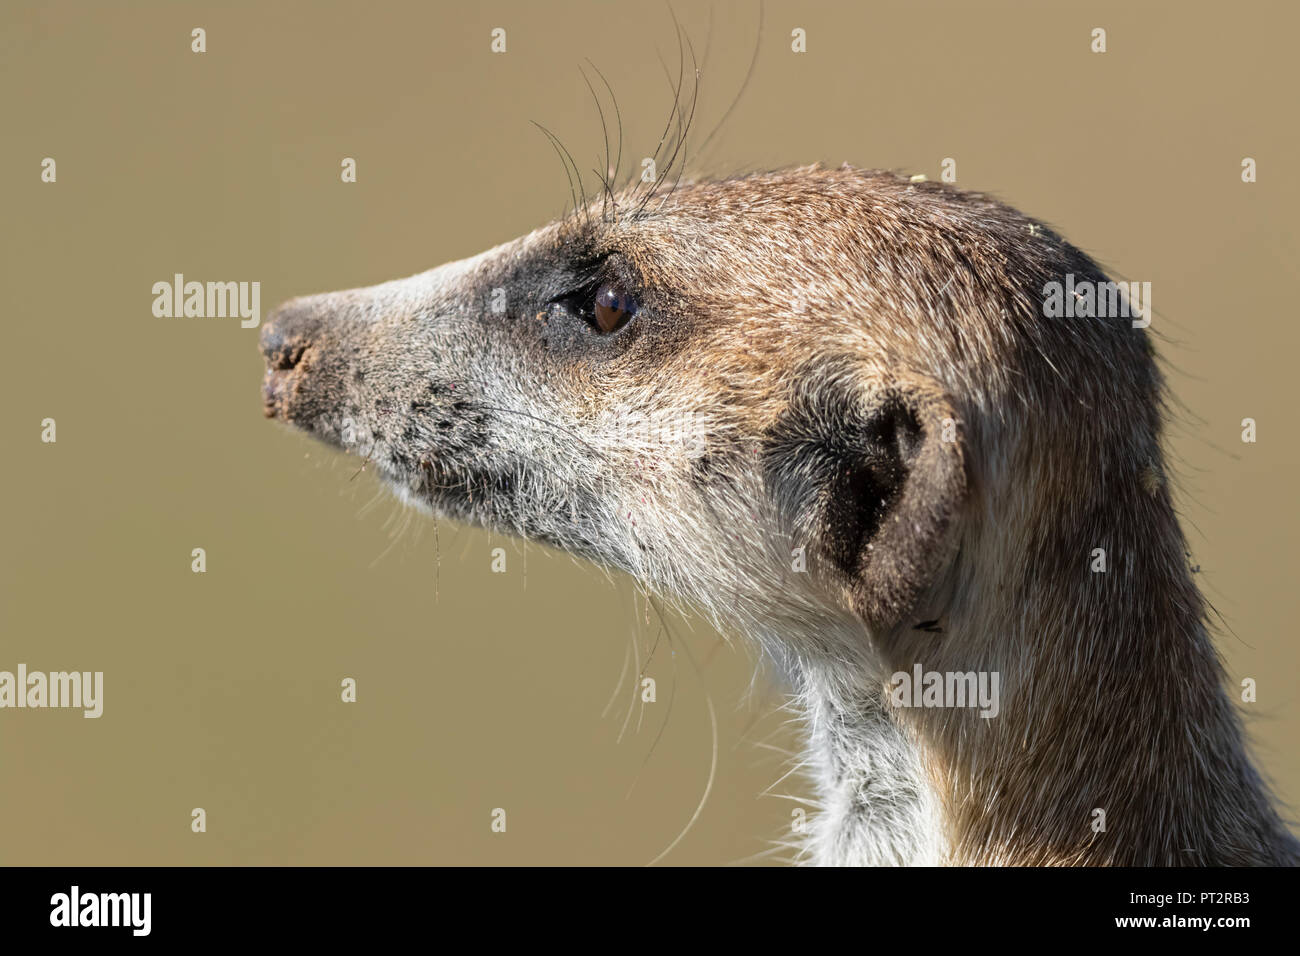 Botswana, Kgalagadi Transfrontier Park, Kalahari, Portrait of meerkat, Suricata suricatta - Stock Image